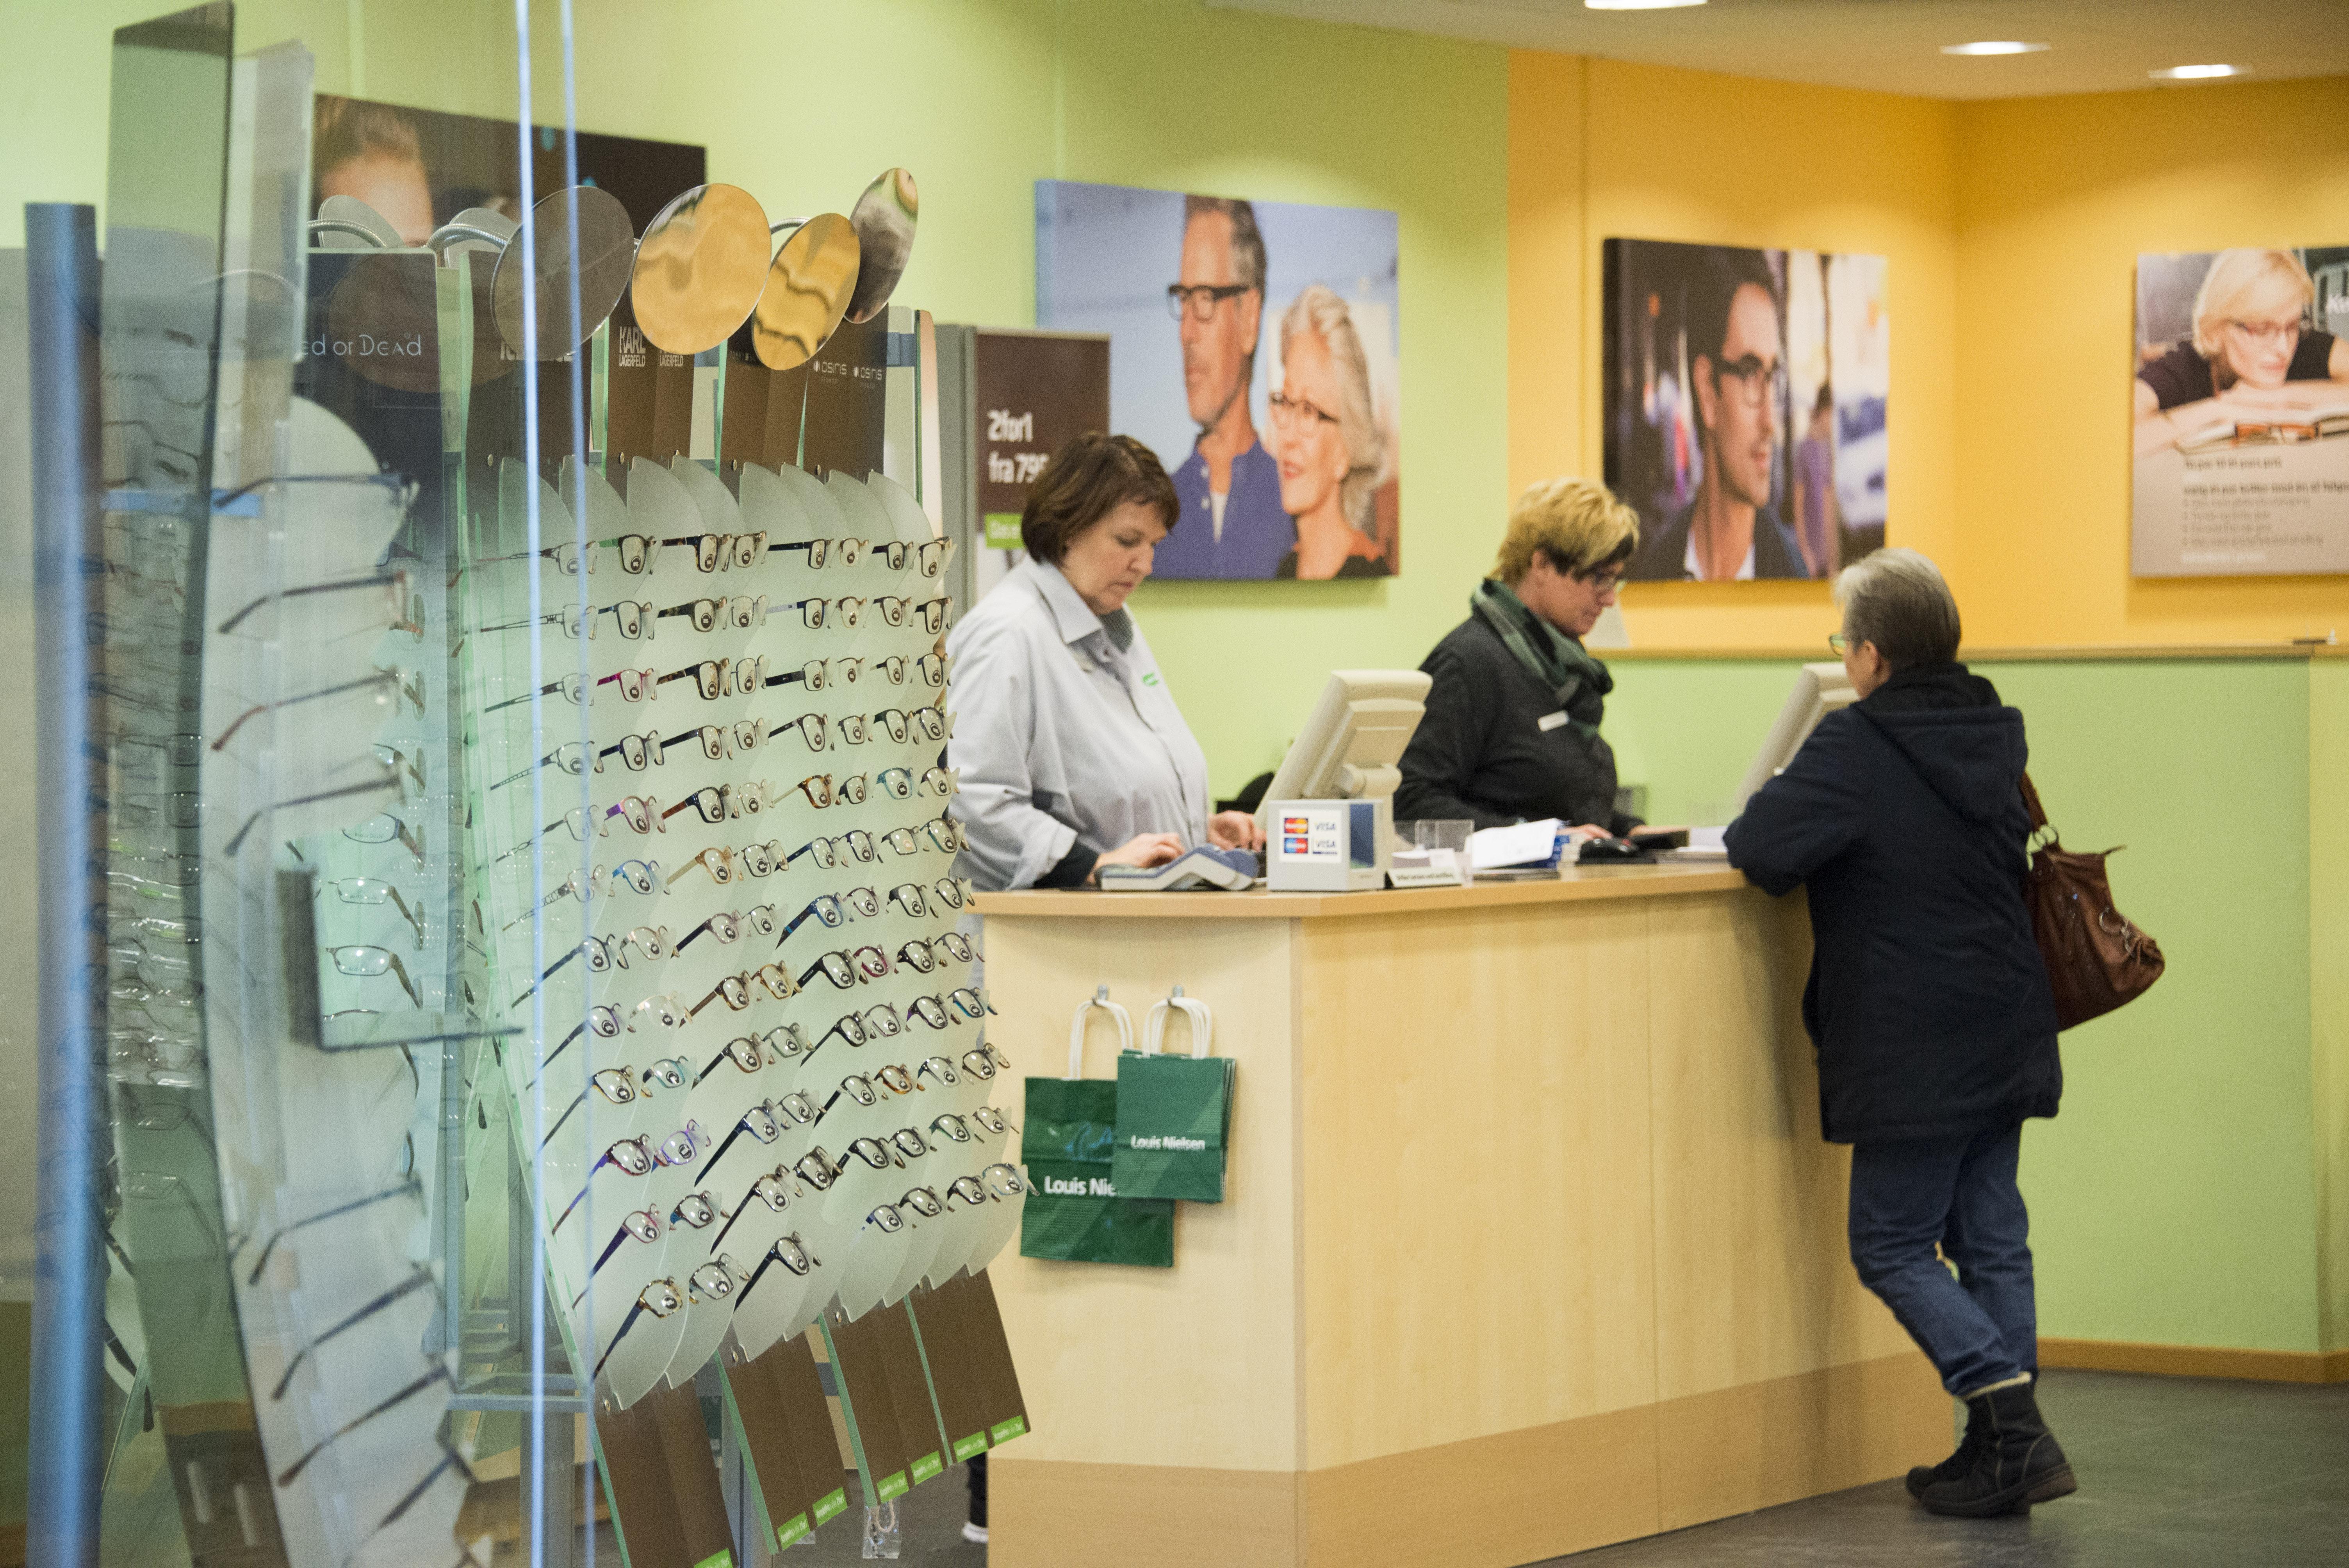 6dec4f209894 Ny optiker til Nakskov - RetailNews